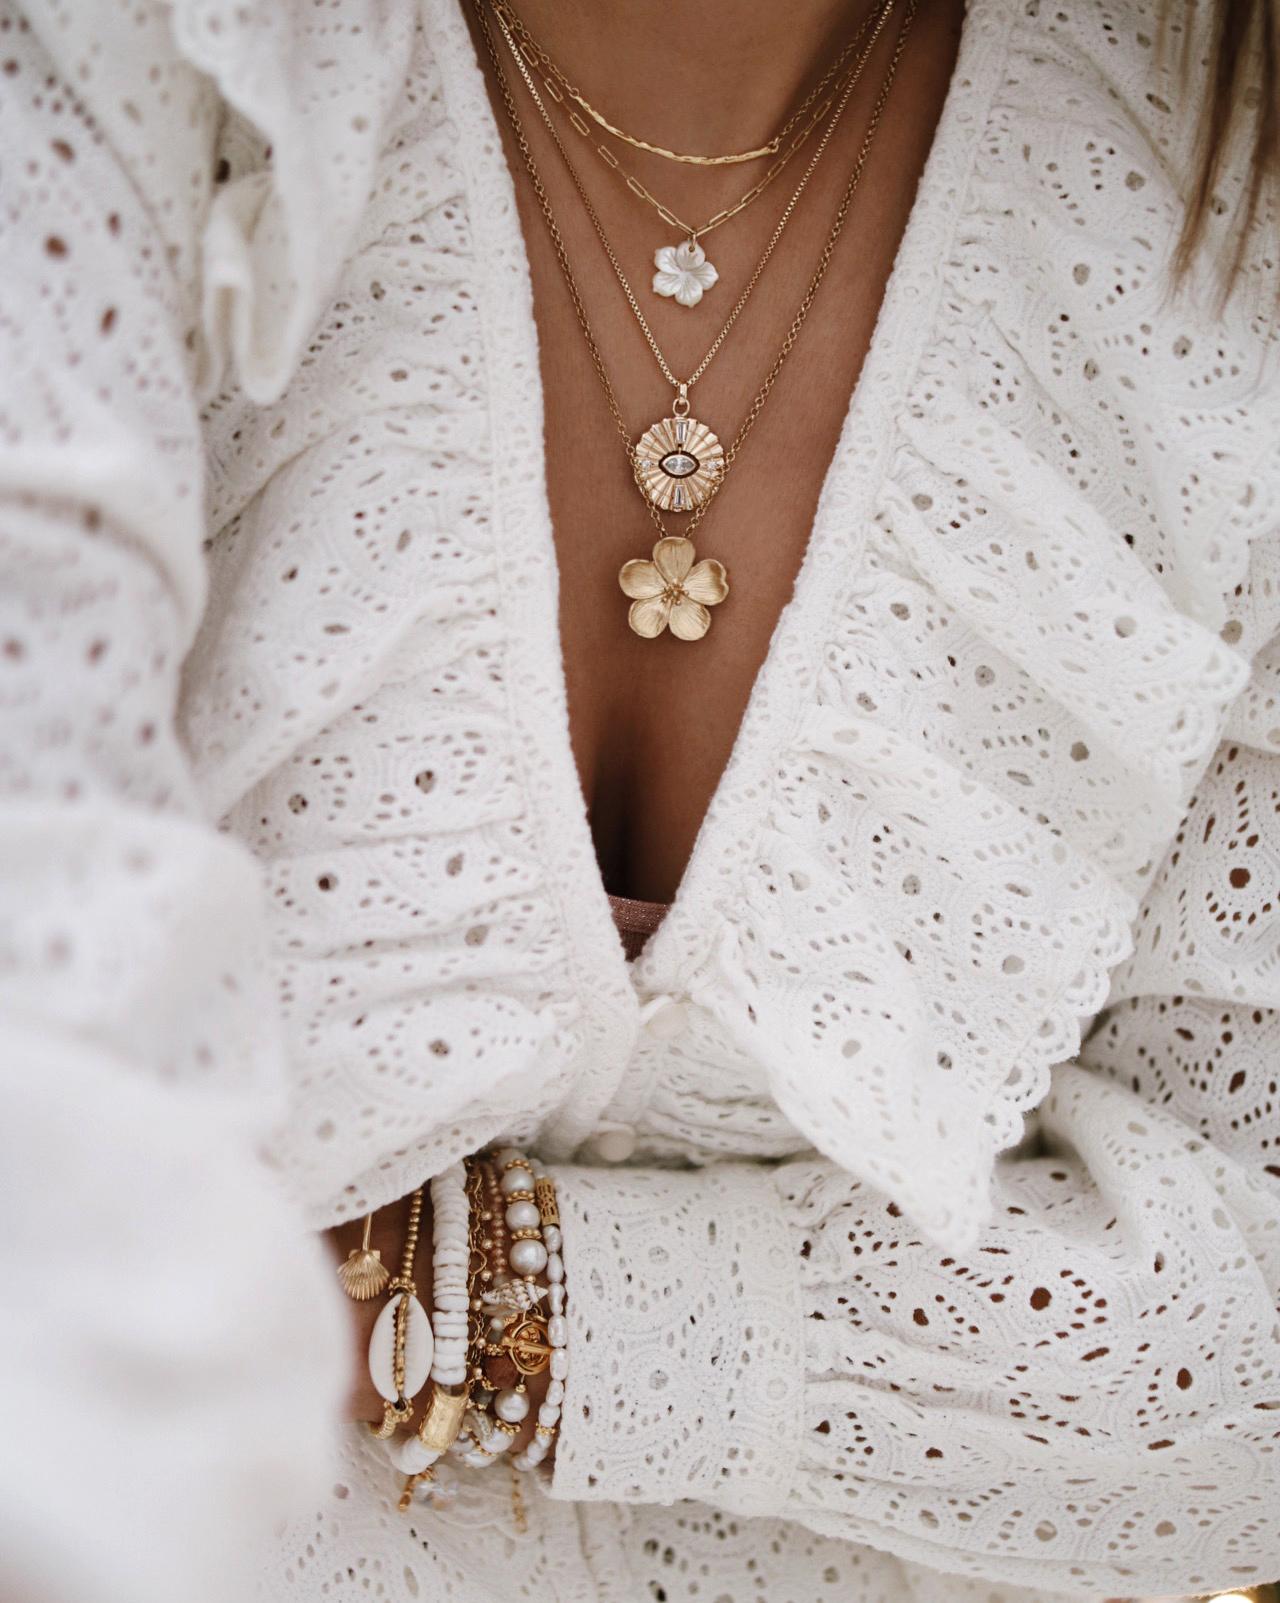 blouse olympe sézane, www.chonandchon.com blouse blanche dentelle